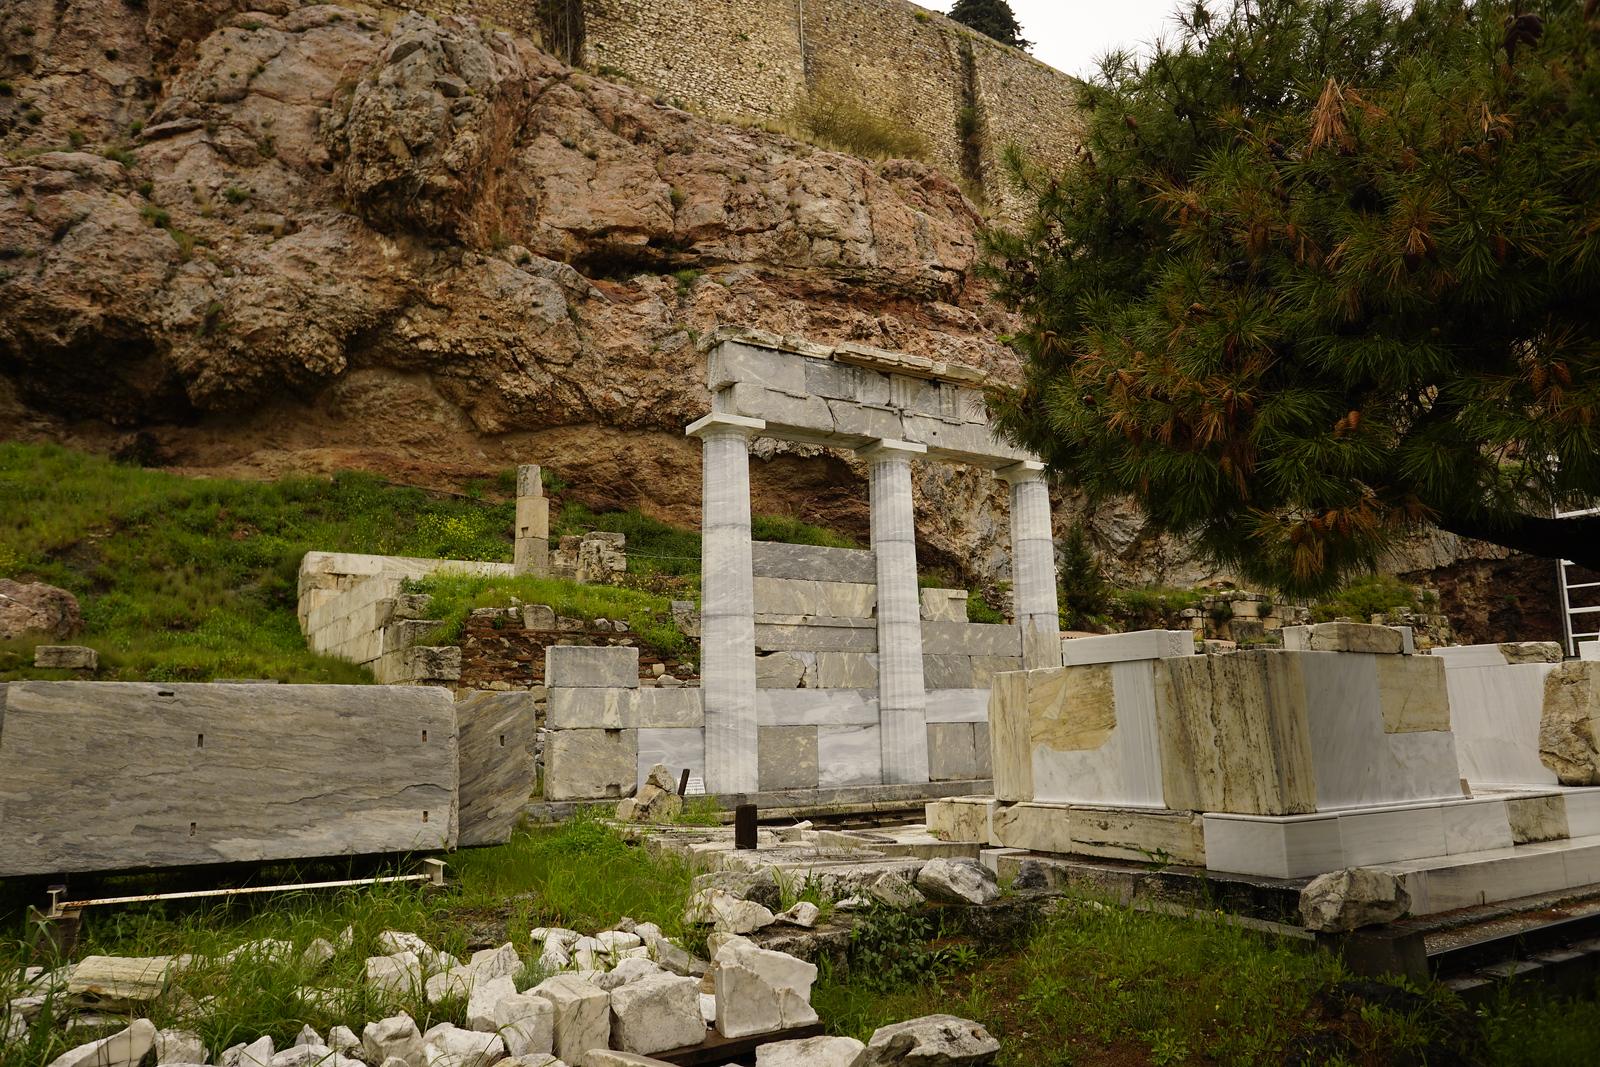 020 - Acropolis - Sanctuary of Asklepios